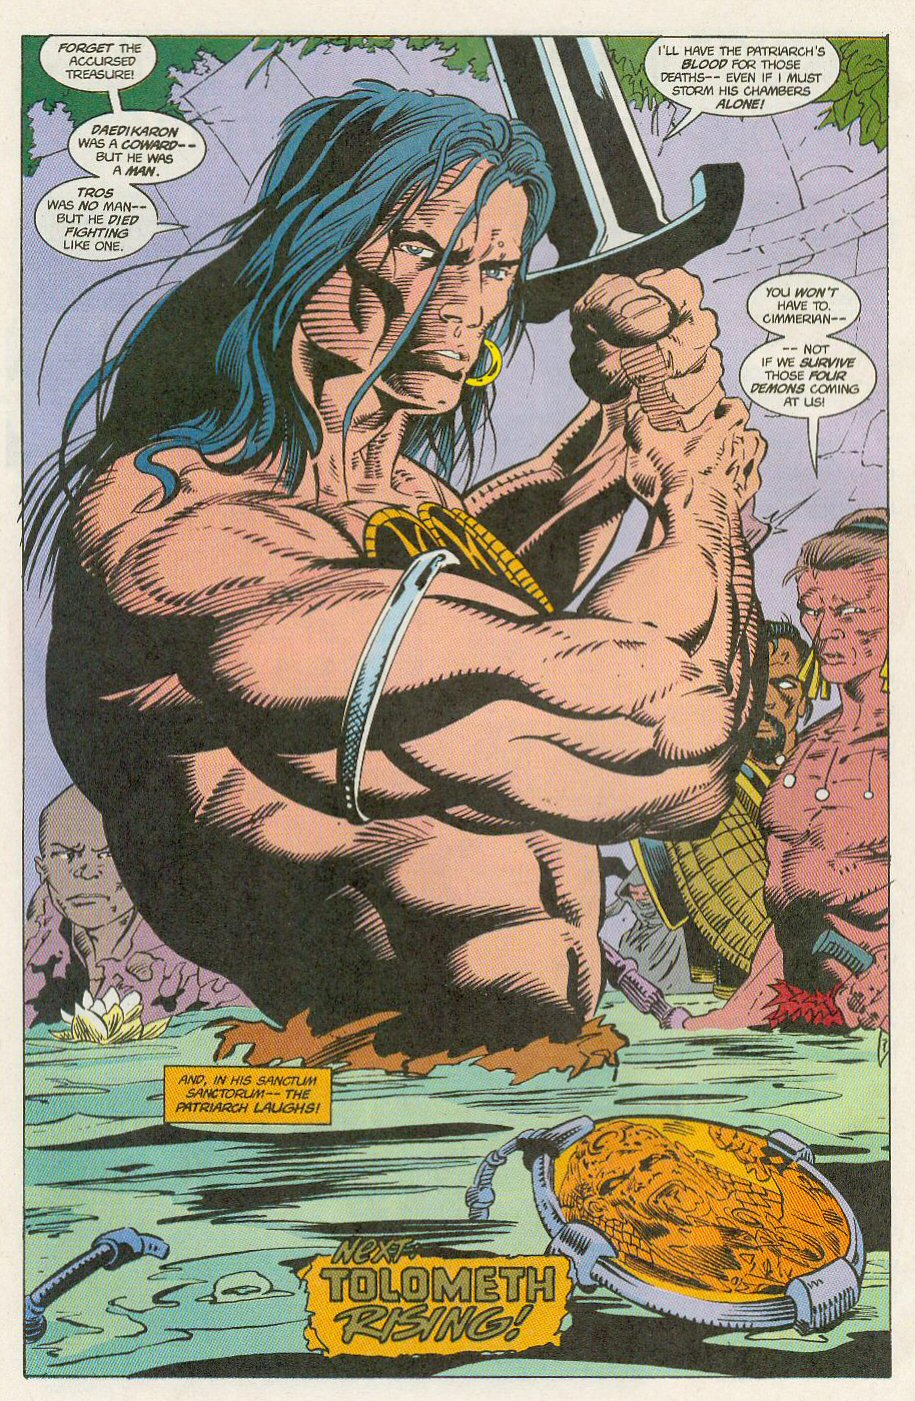 Read online Conan the Adventurer comic -  Issue #13 - 20